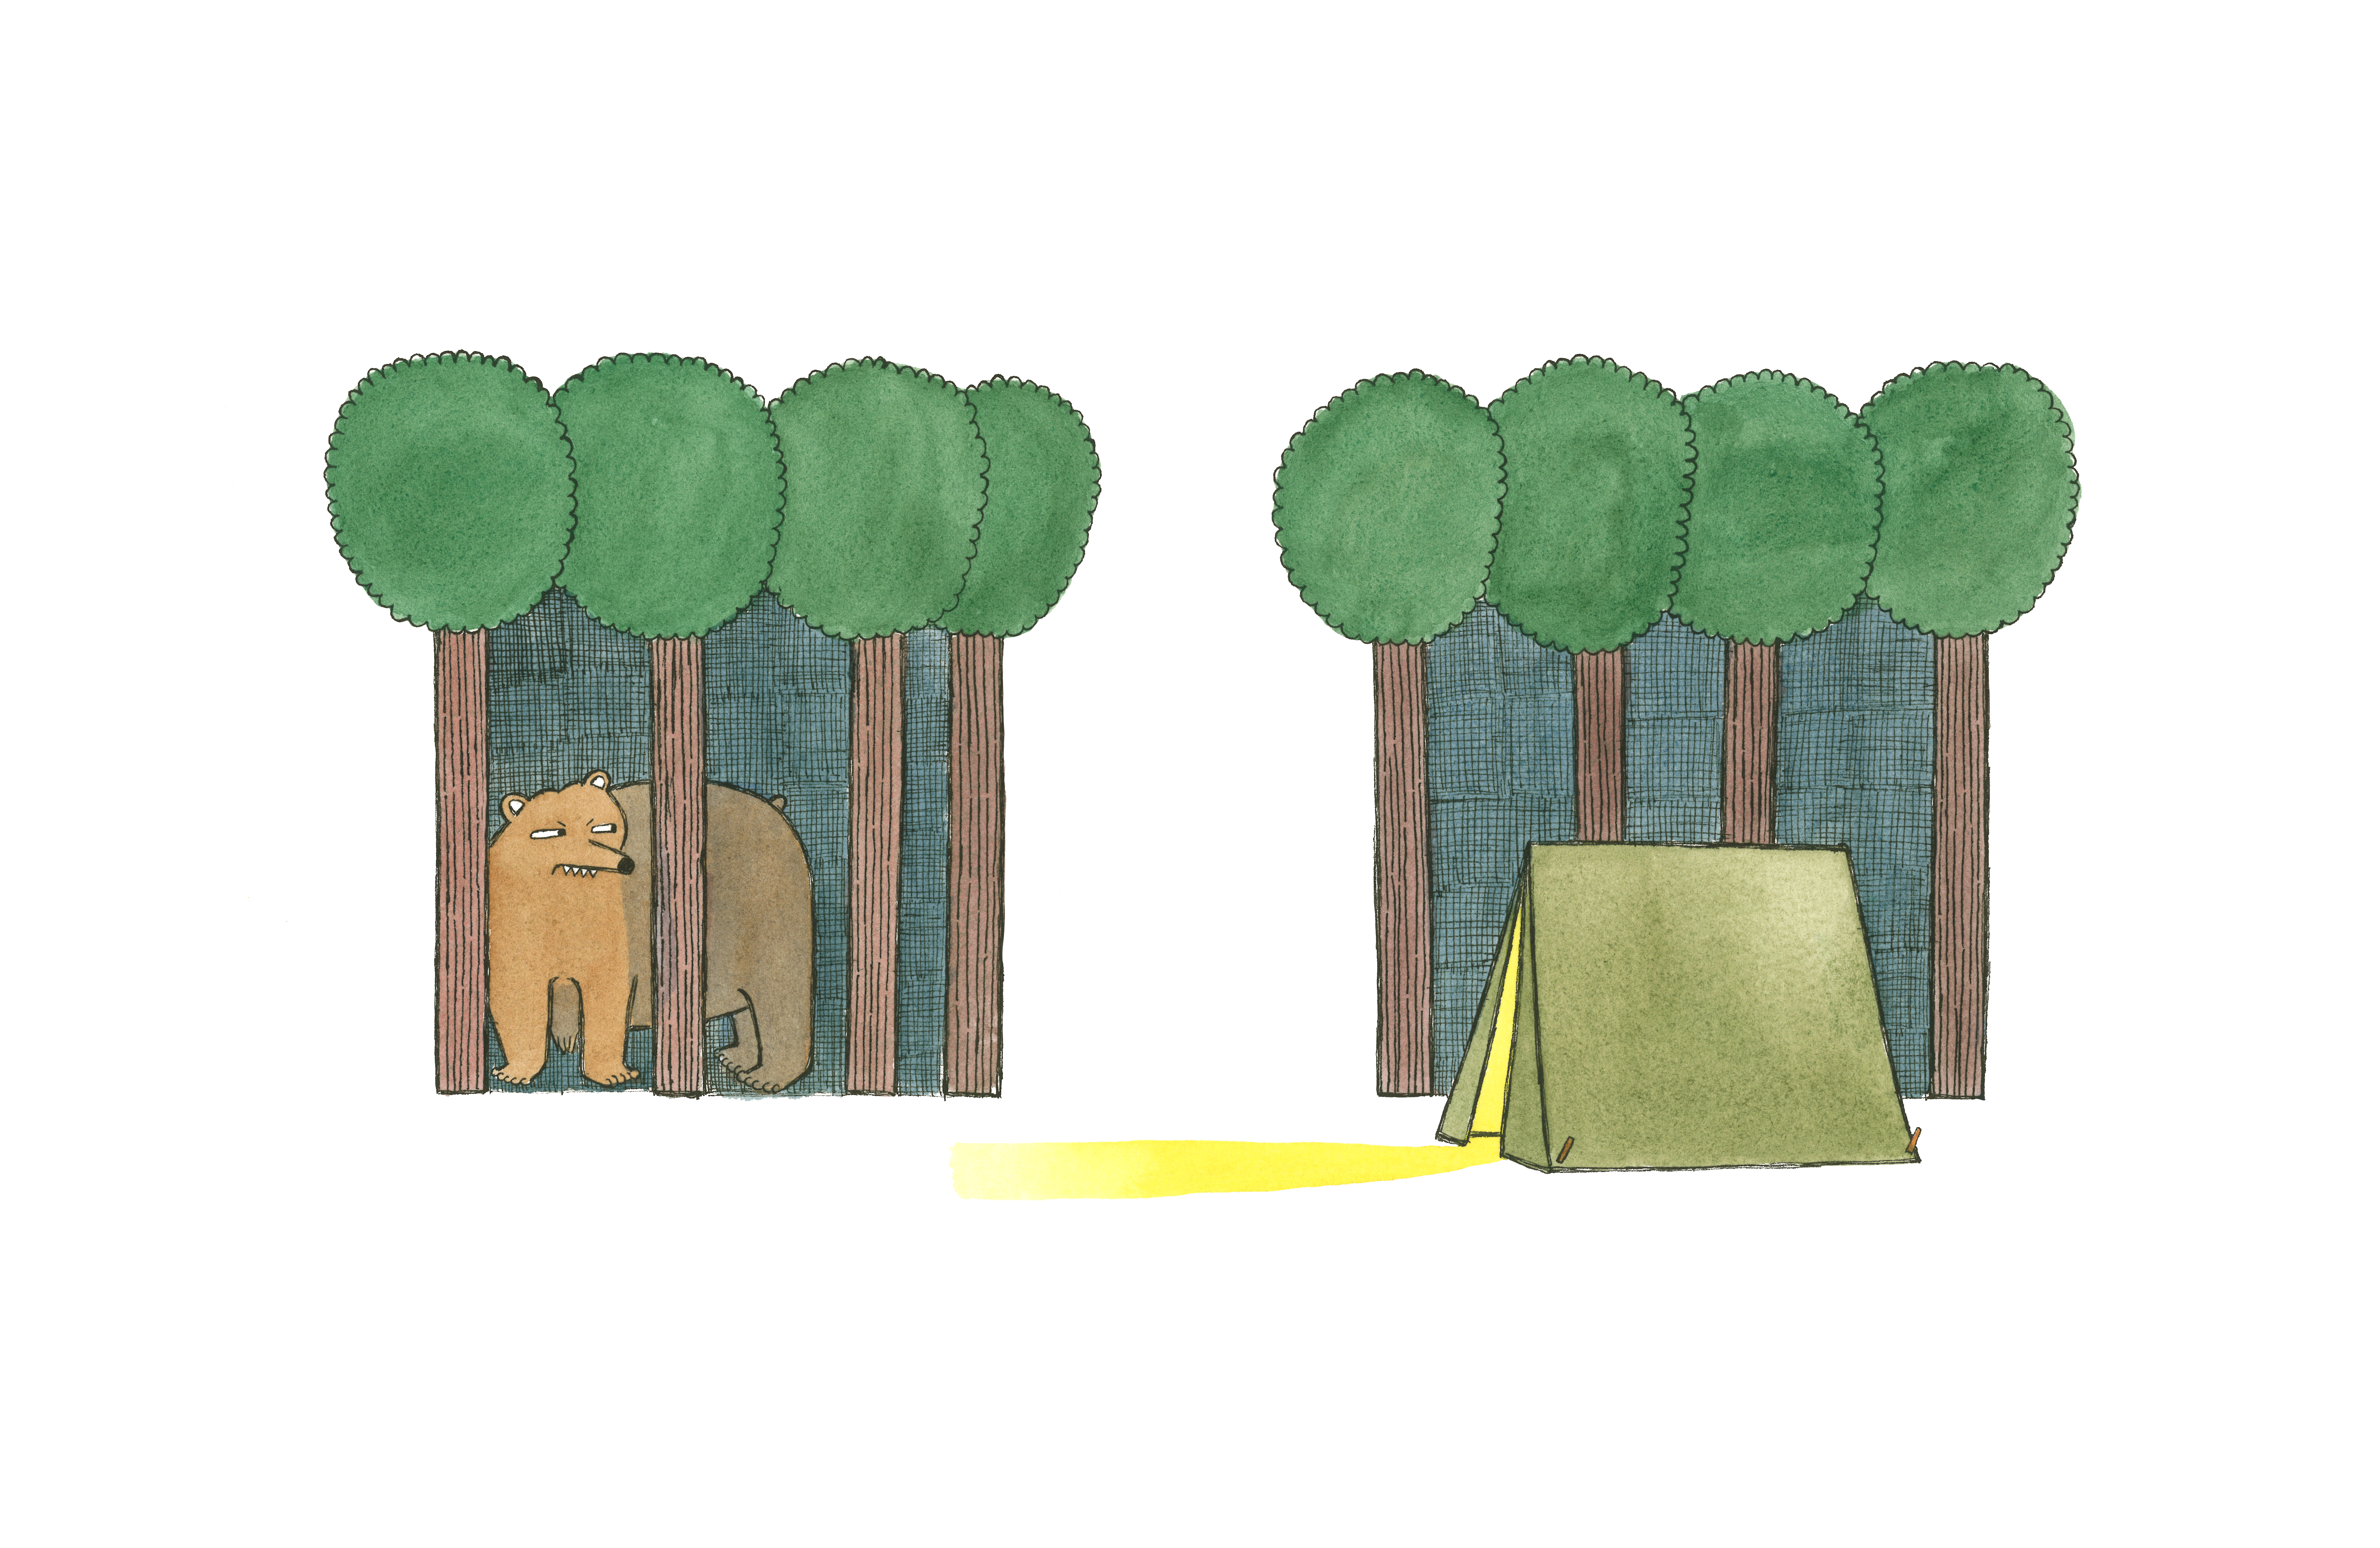 Bear_Tent copy.jpg